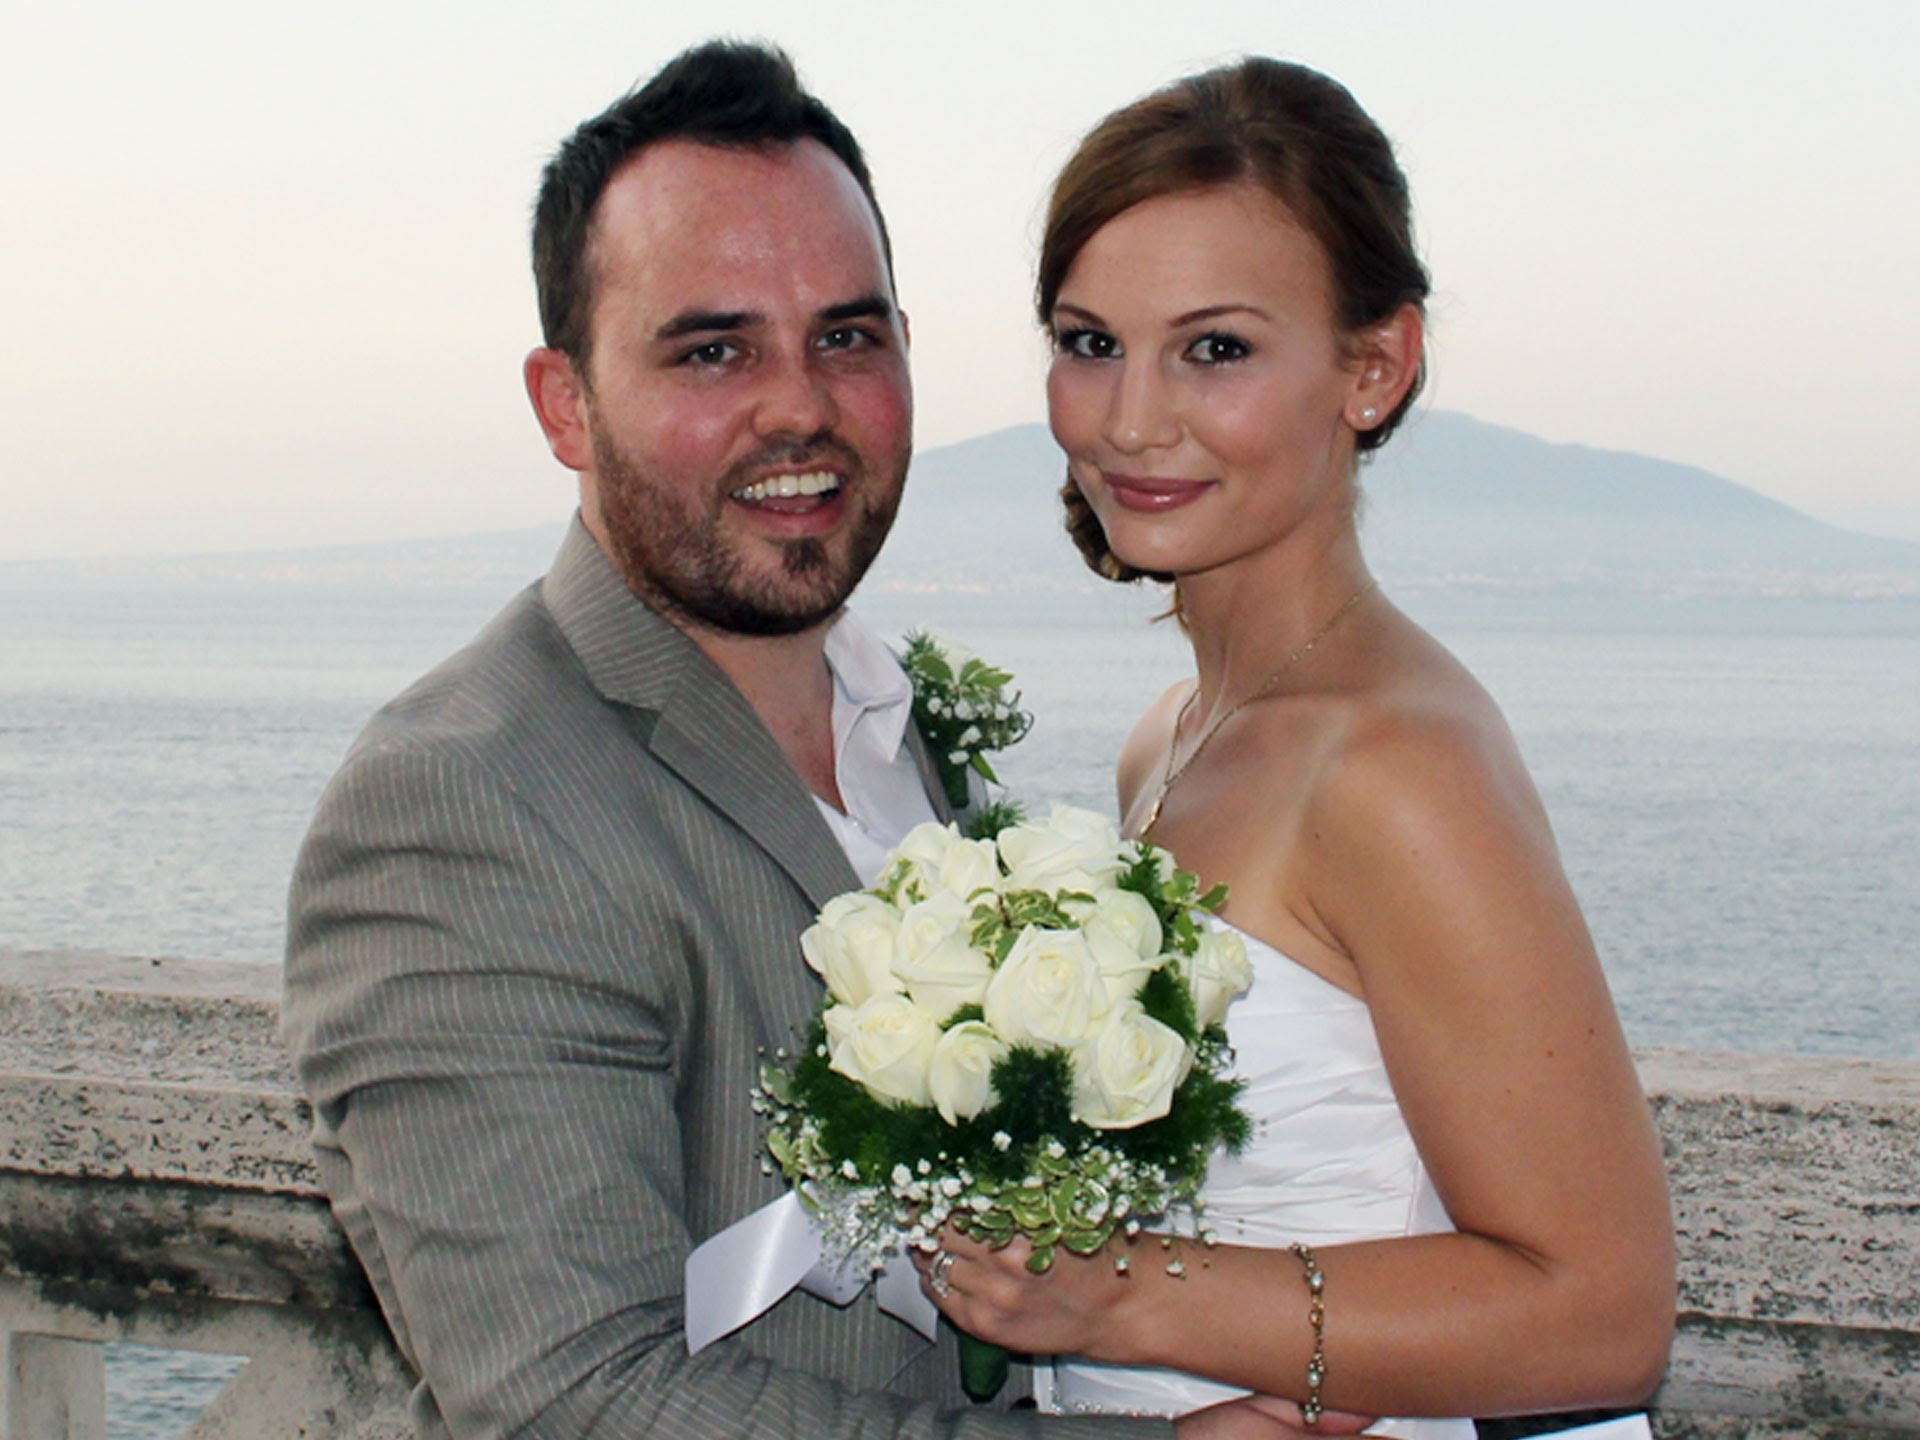 Anna Saccone & Jonathan Joly